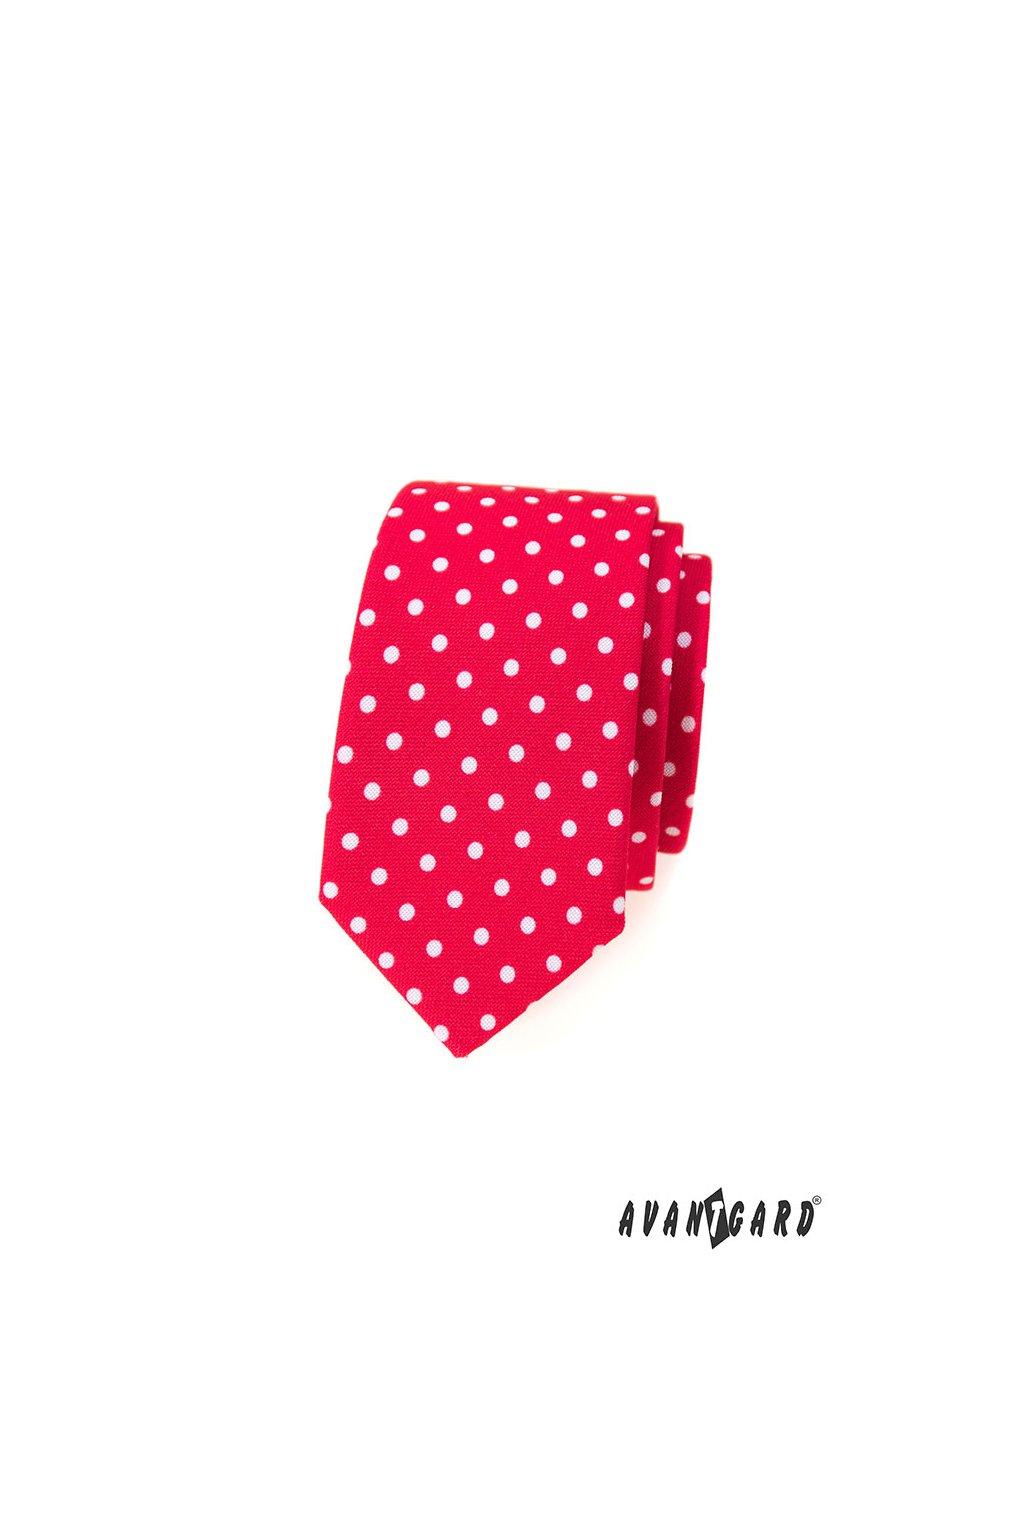 Kravata SLIM AVANTGARD LUX červená s bílými puntíky 571 - 1979